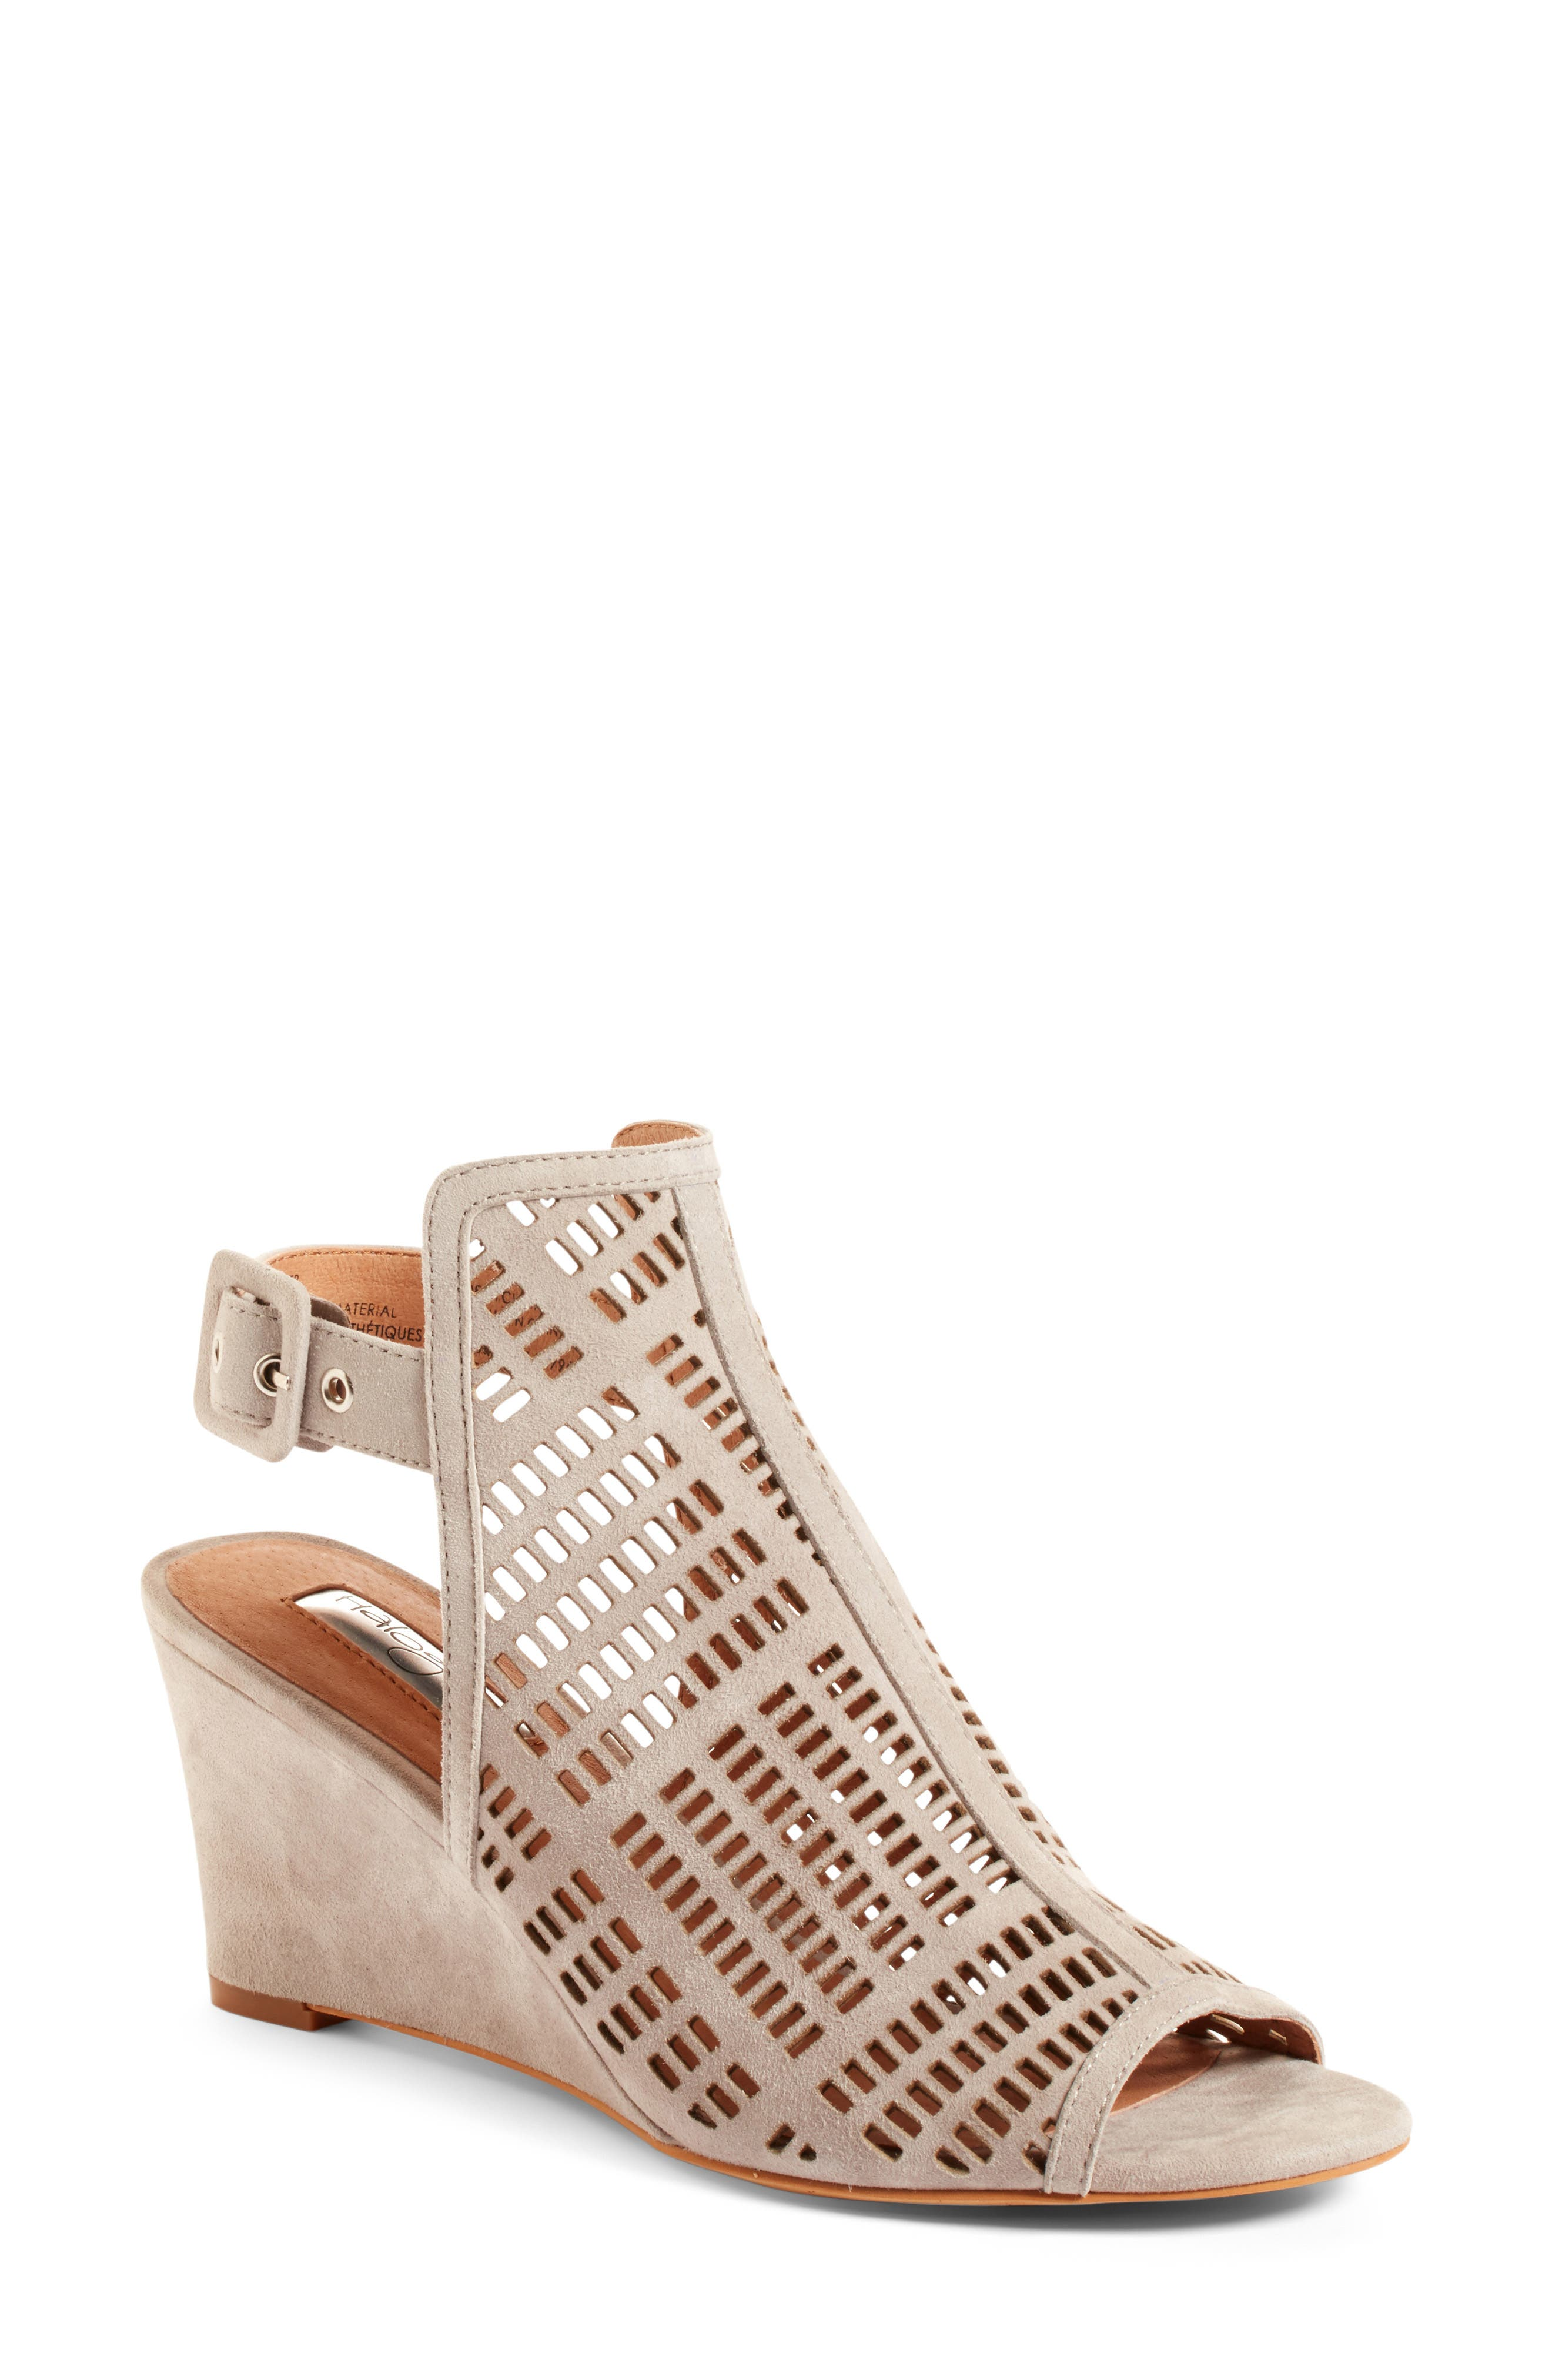 Main Image - Halogen® Rosina Laser Cut Wedge Sandal (Women)